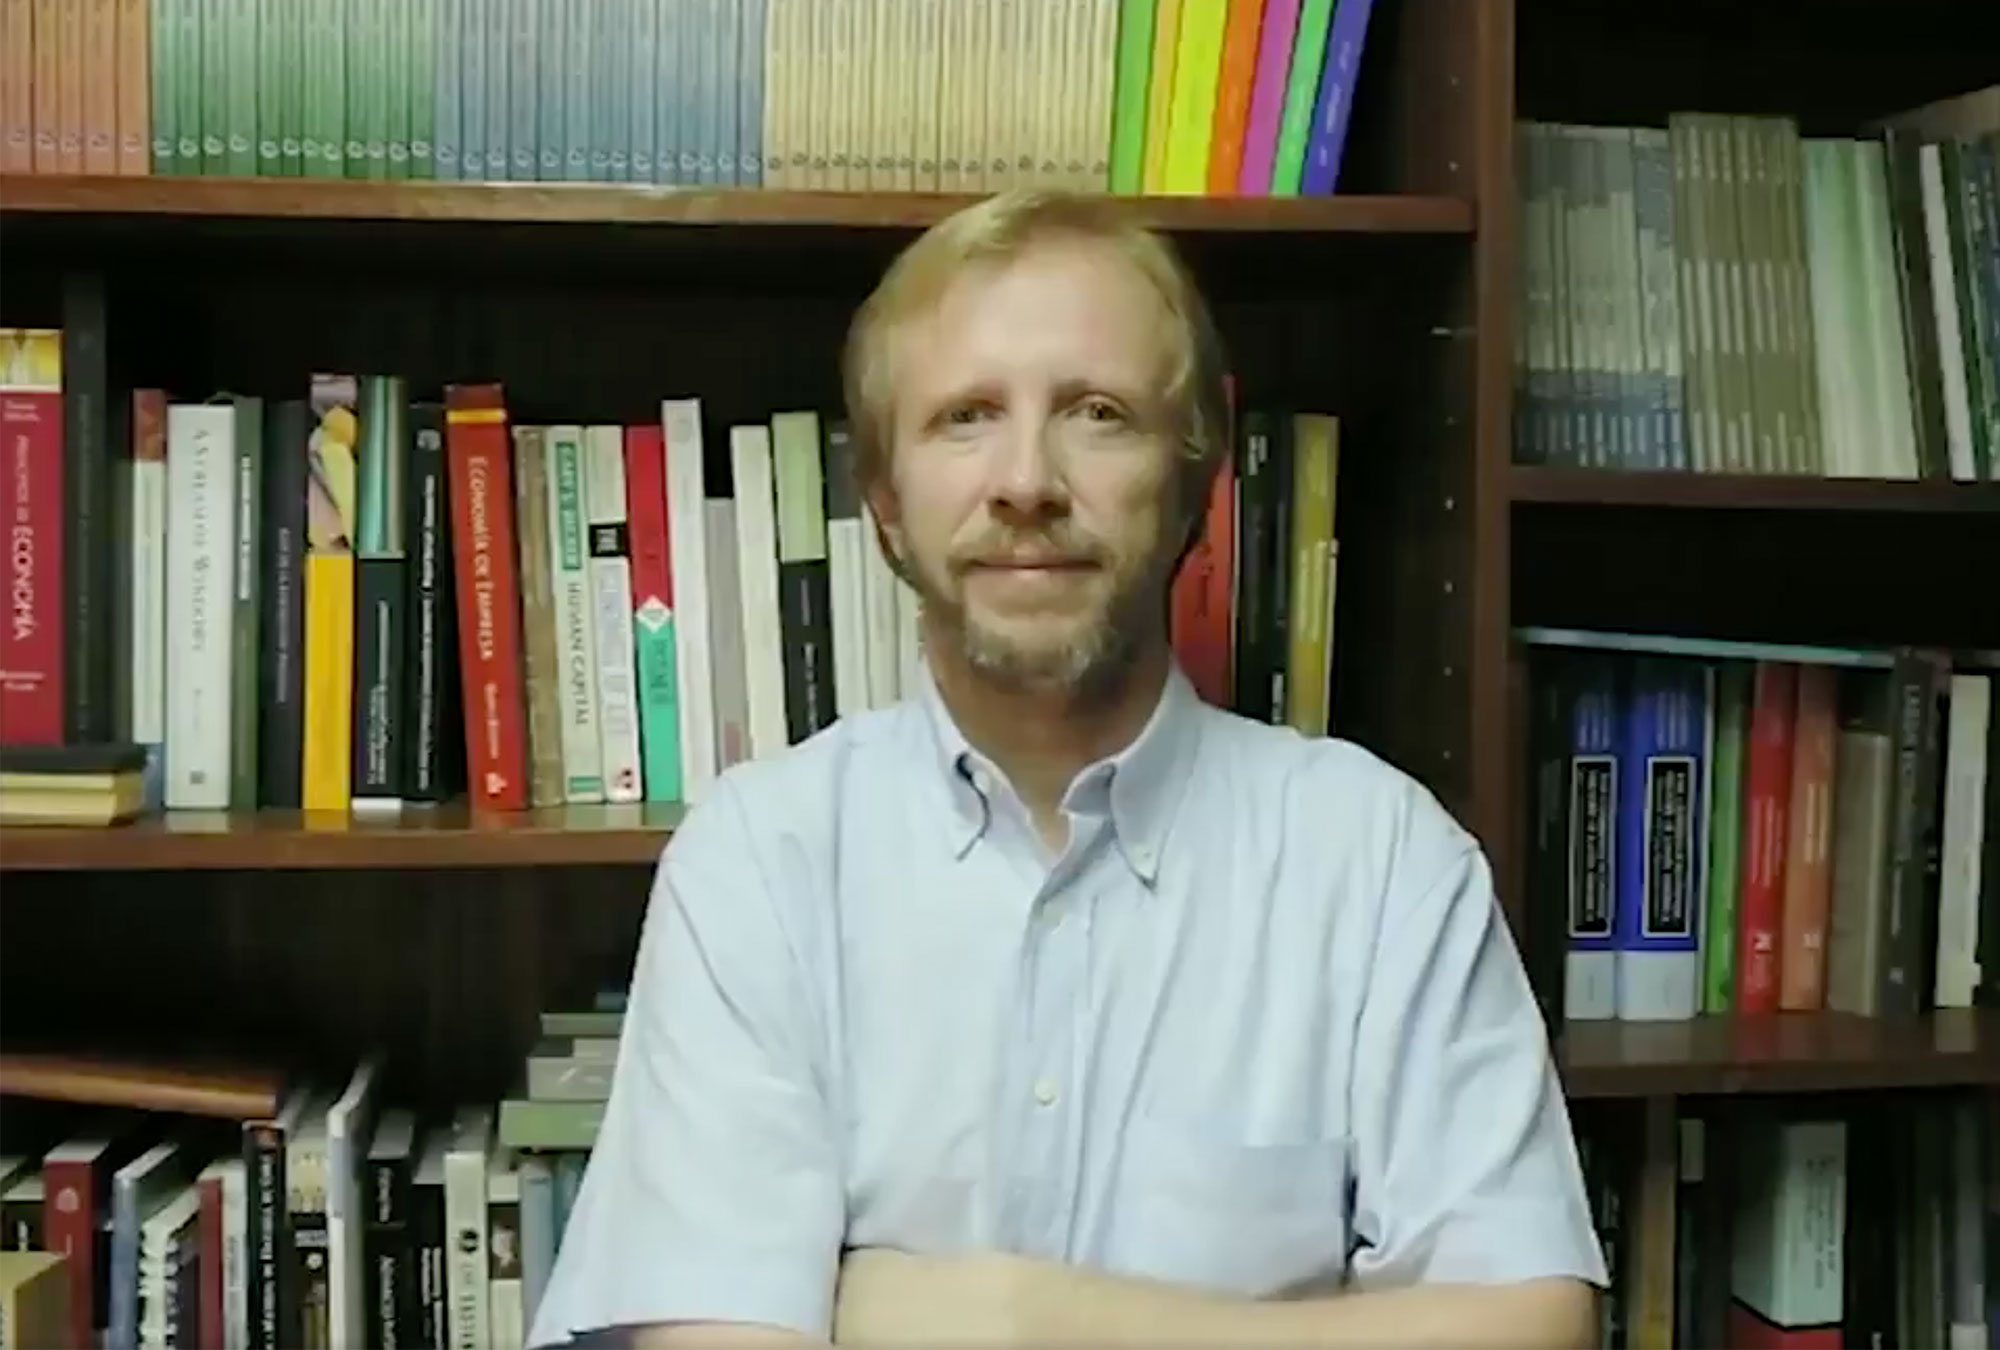 Francisco Gallego